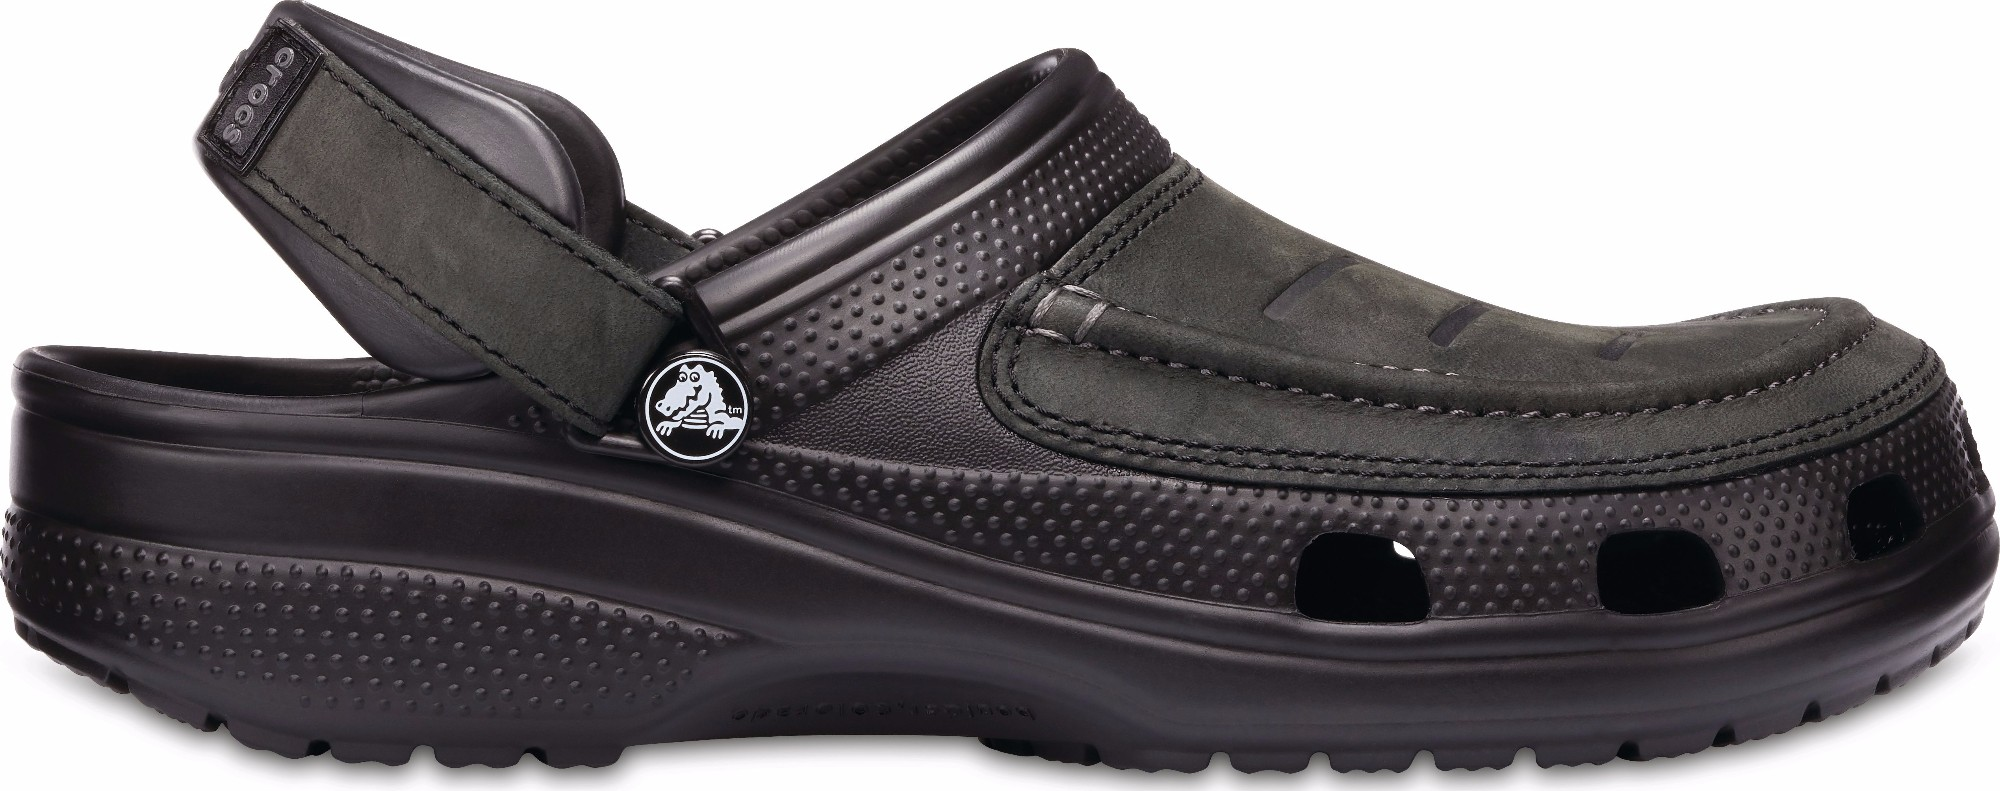 Crocs™ Yukon Vista Clog Black/Black 41